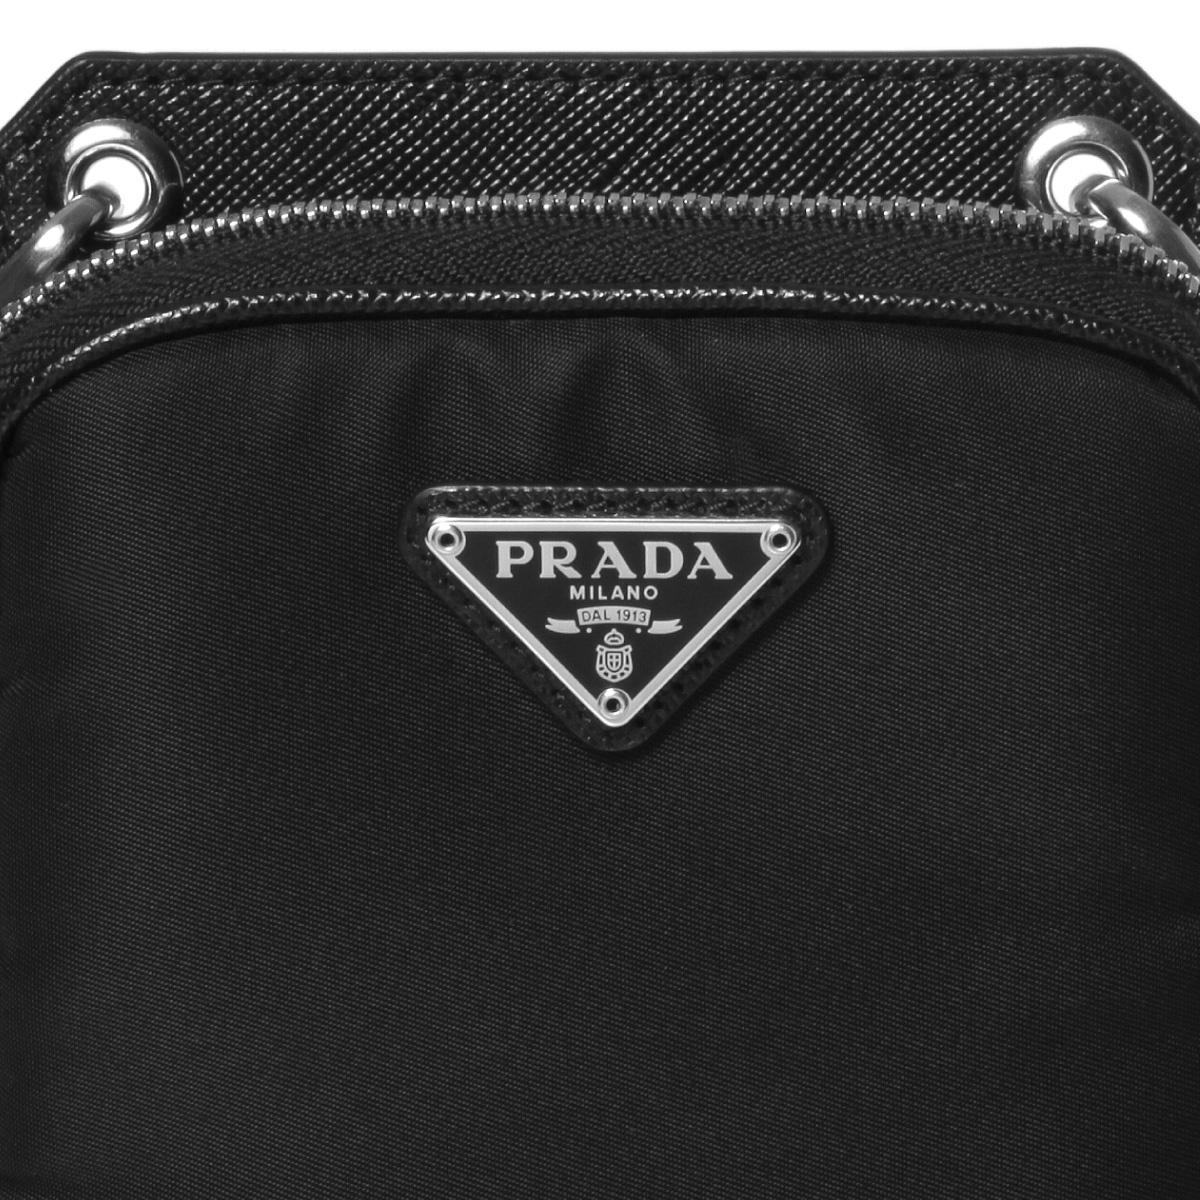 PRADA プラダ | ショルダー付 スマートフォンケース